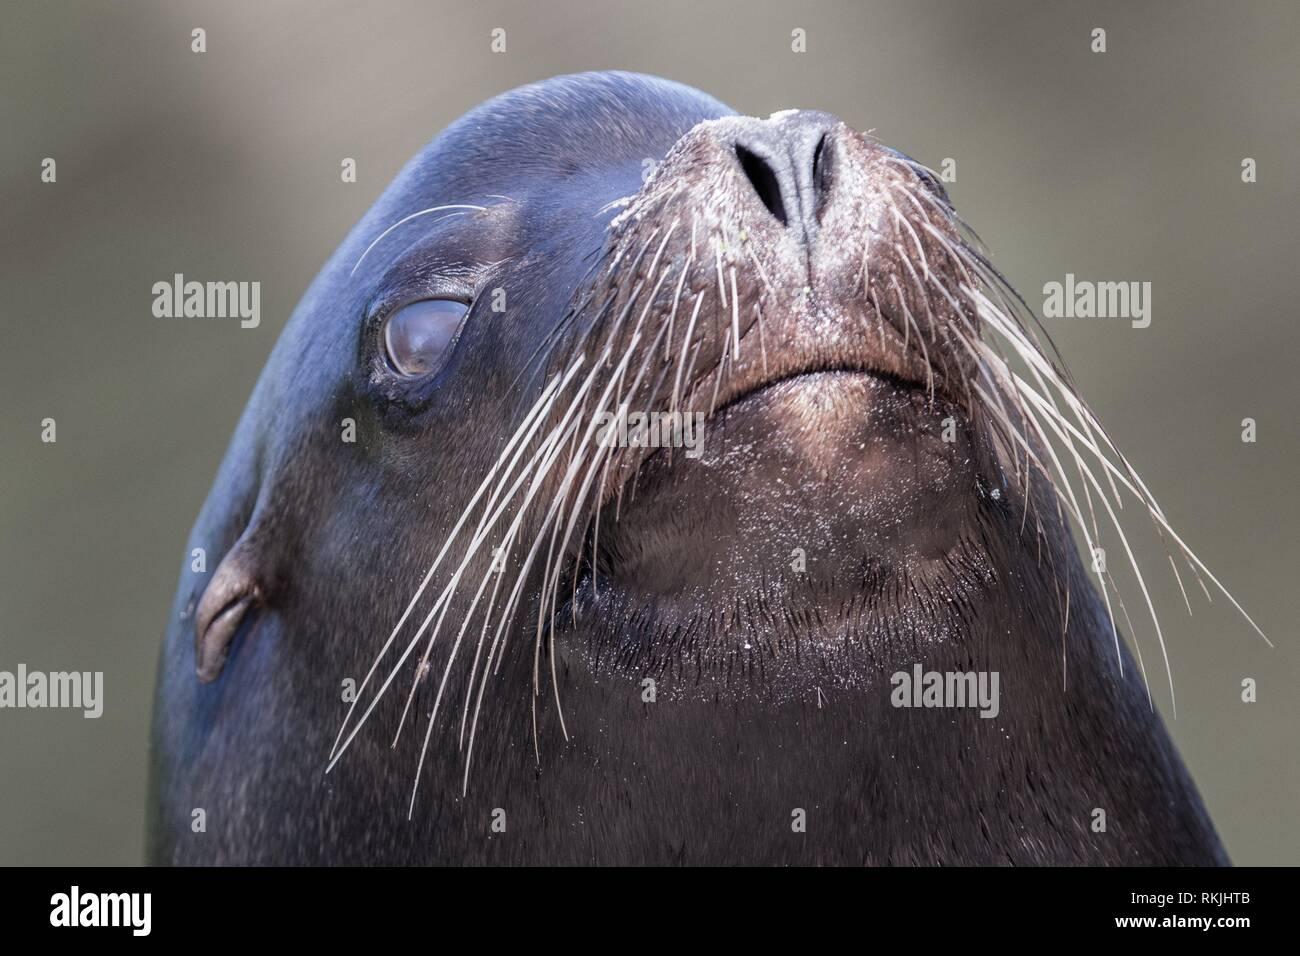 Sea lion closeup - Selective focus on the eye. - Stock Image